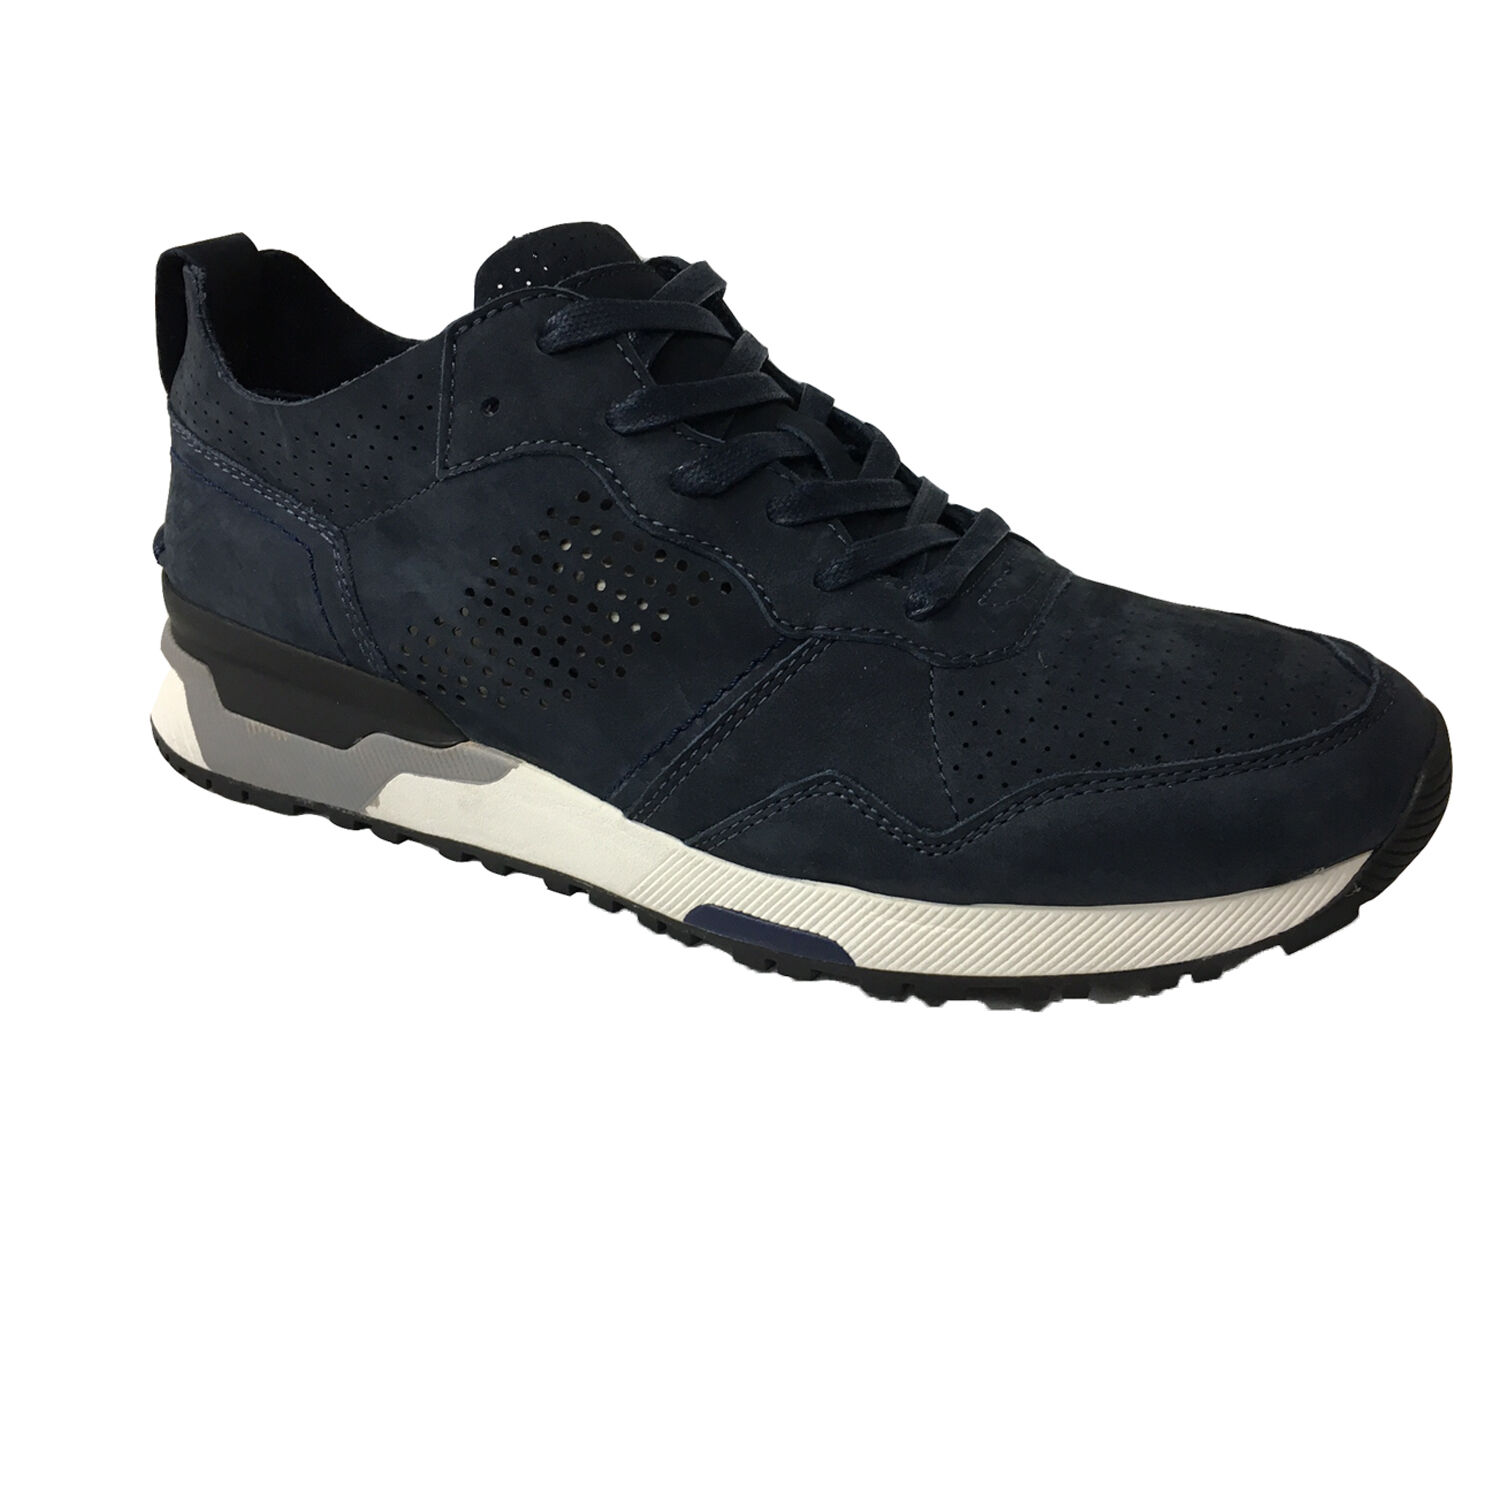 CRIME LONDON 11524S17B scarpa uomo blu sfoderata mod 11524S17B LONDON 100% pelle scamosciata 2c8aa8